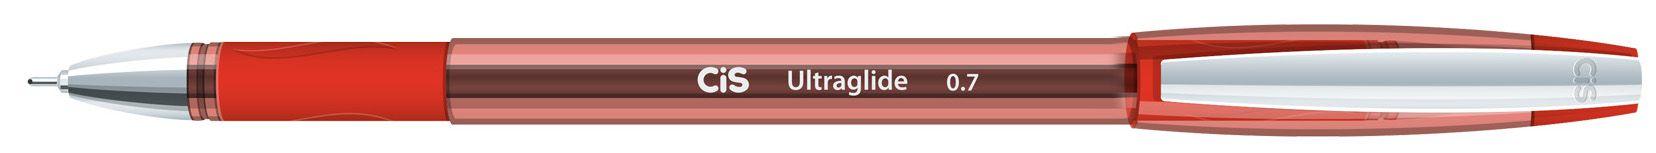 Caneta Ultraglide 0.7 Vermelha